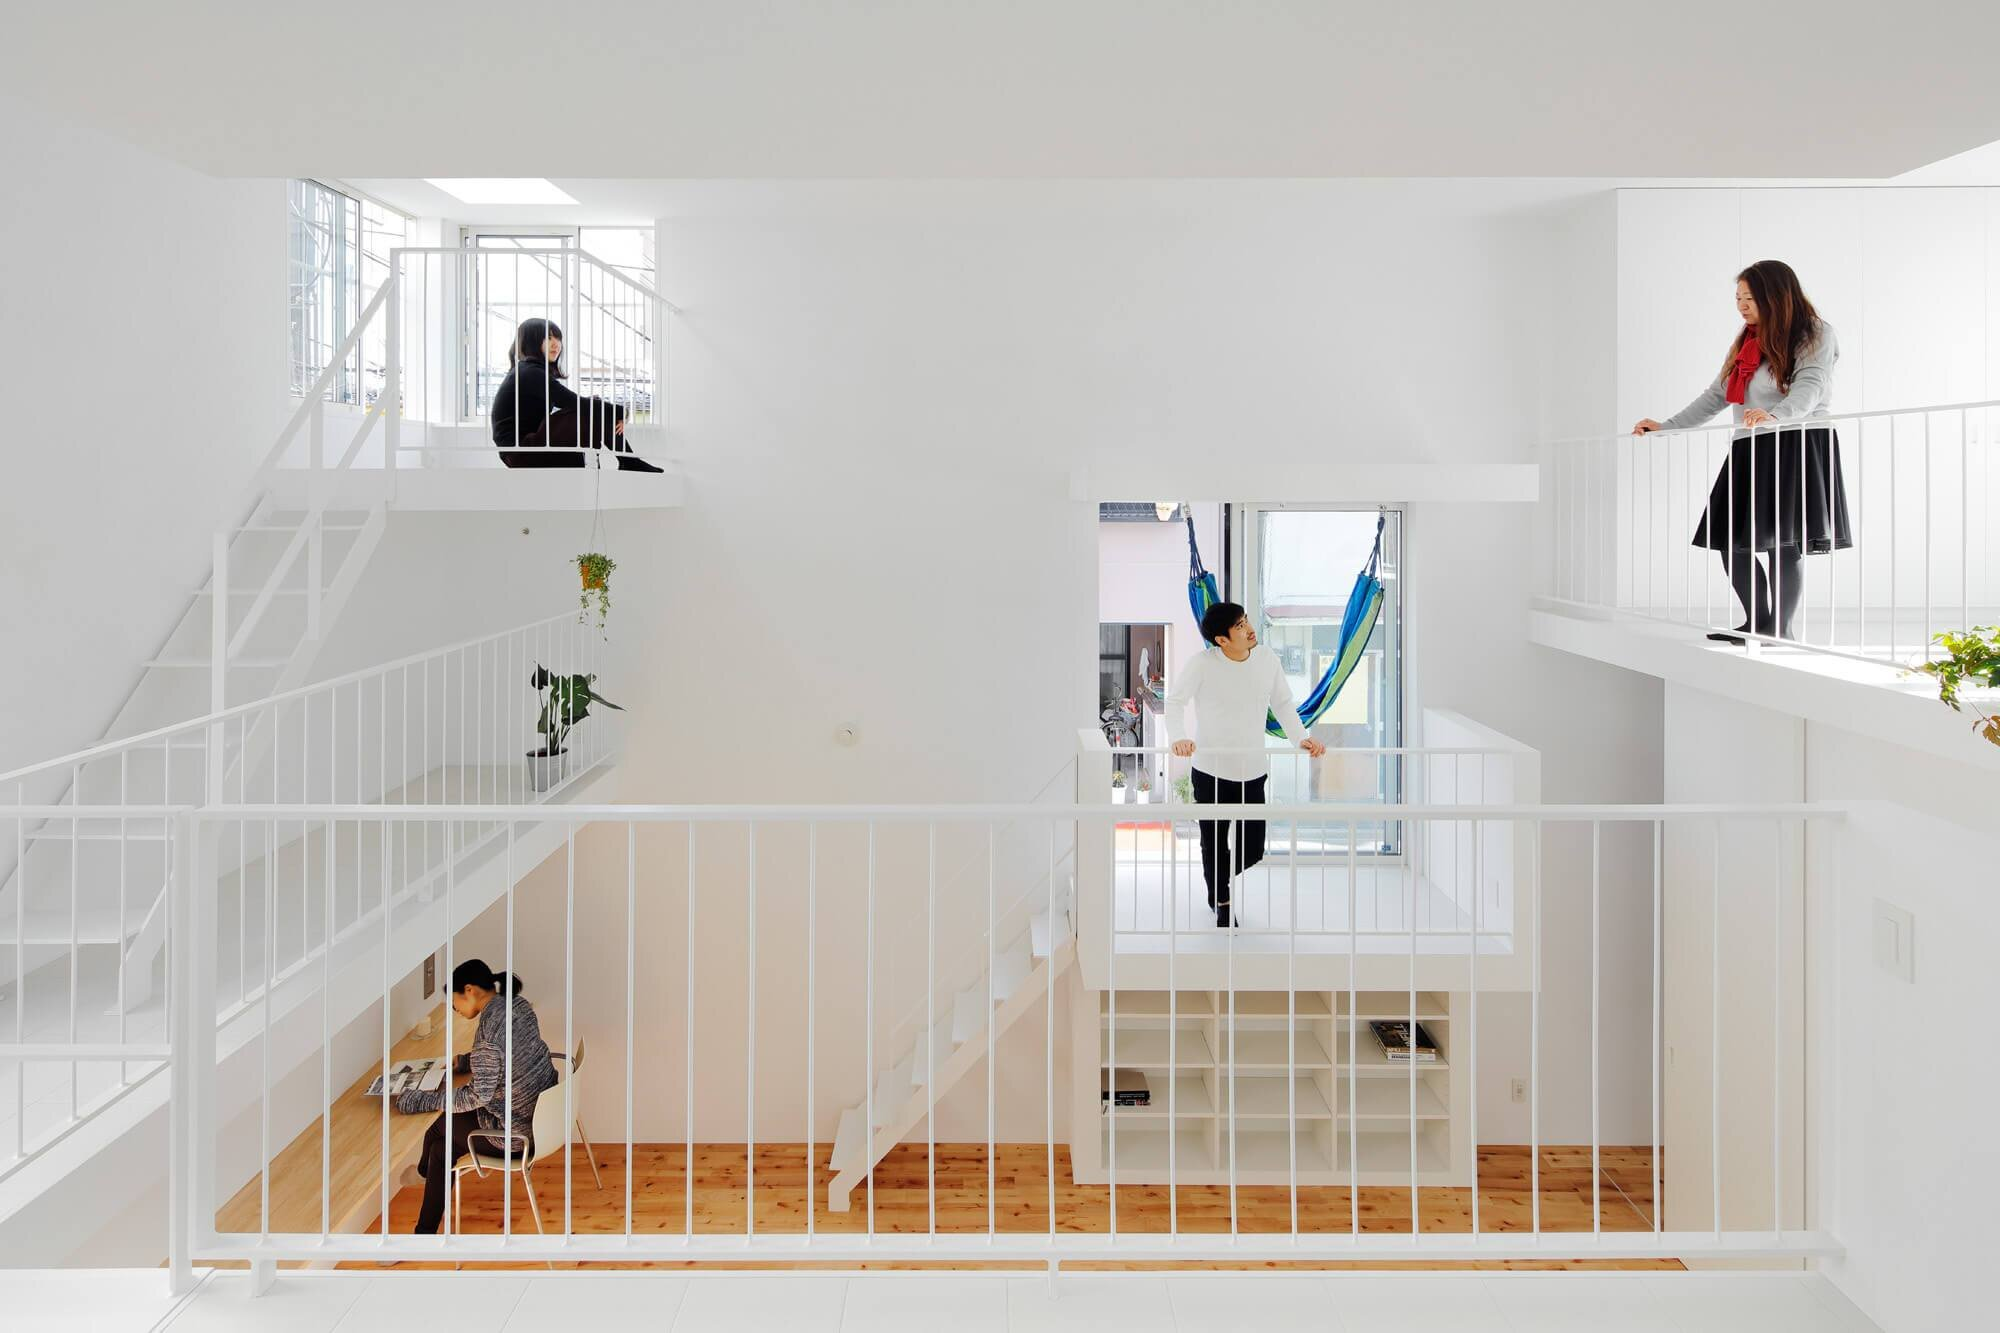 Balcony-House-Takeshi-Hosaka-Architects-Japan-0